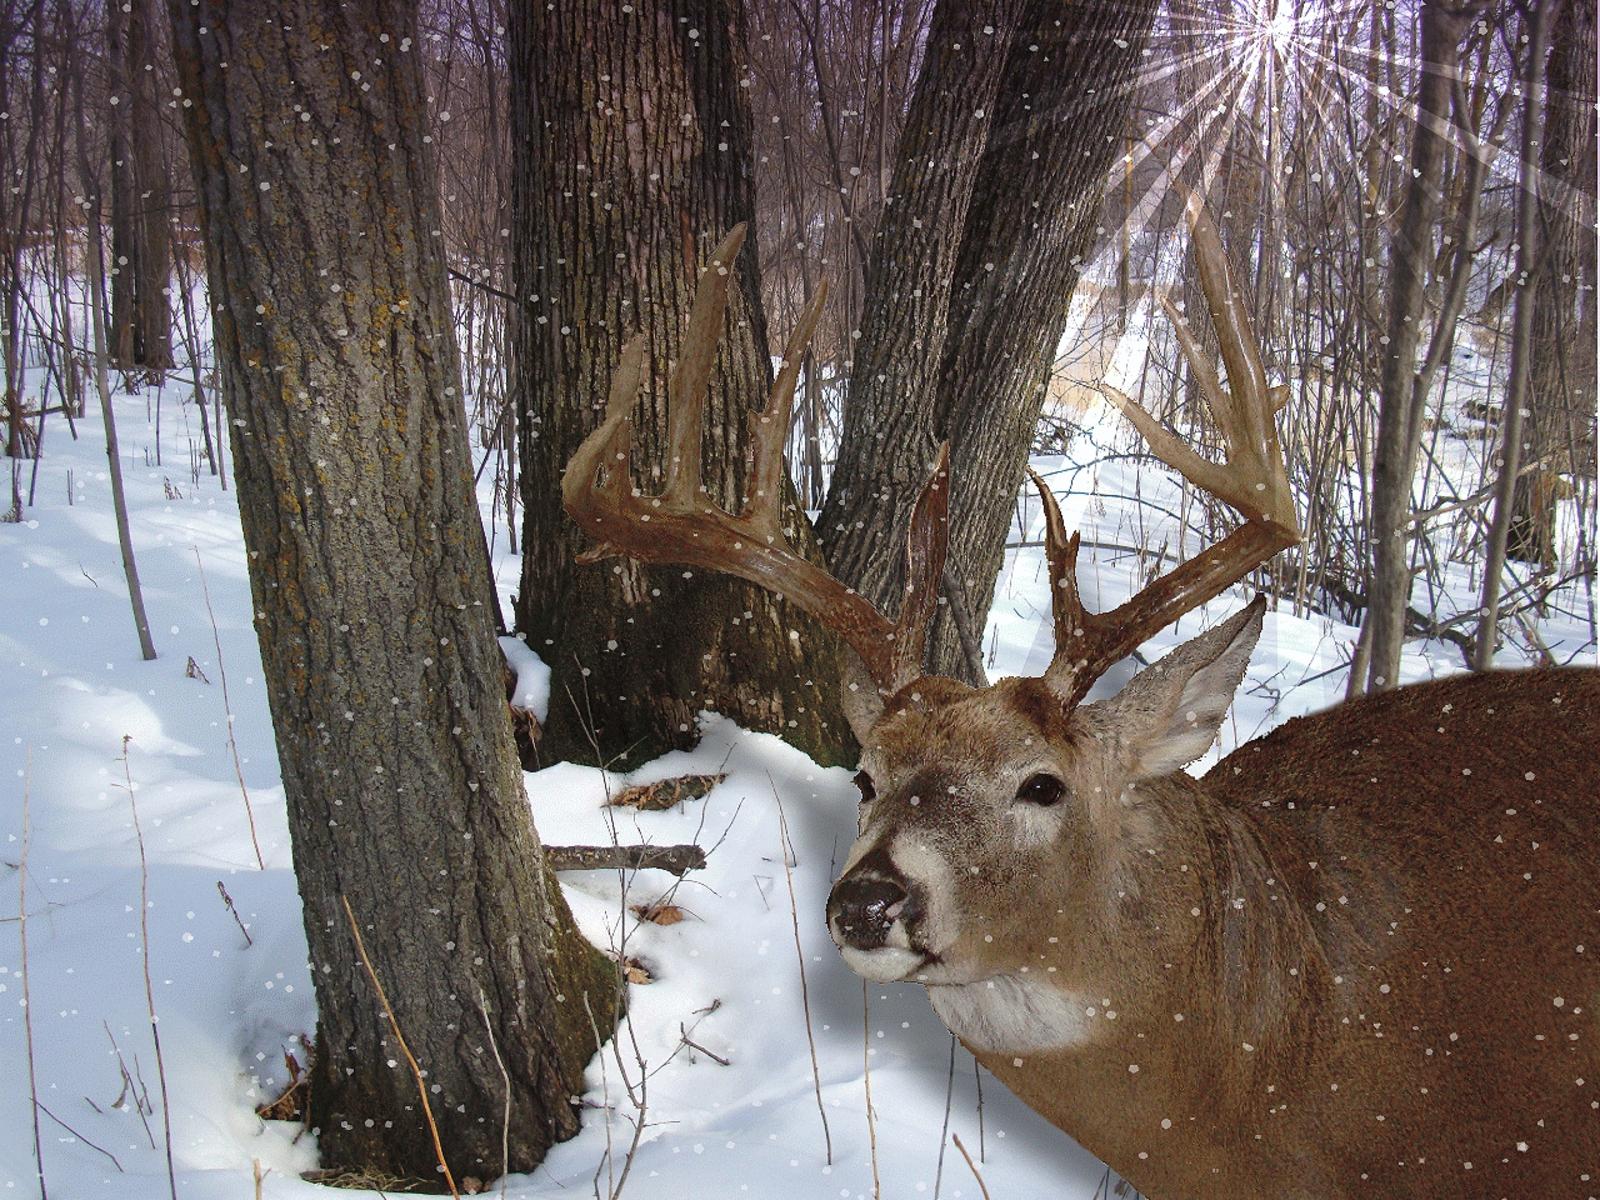 Free Whitetail Deer Wallpaper Screensaver